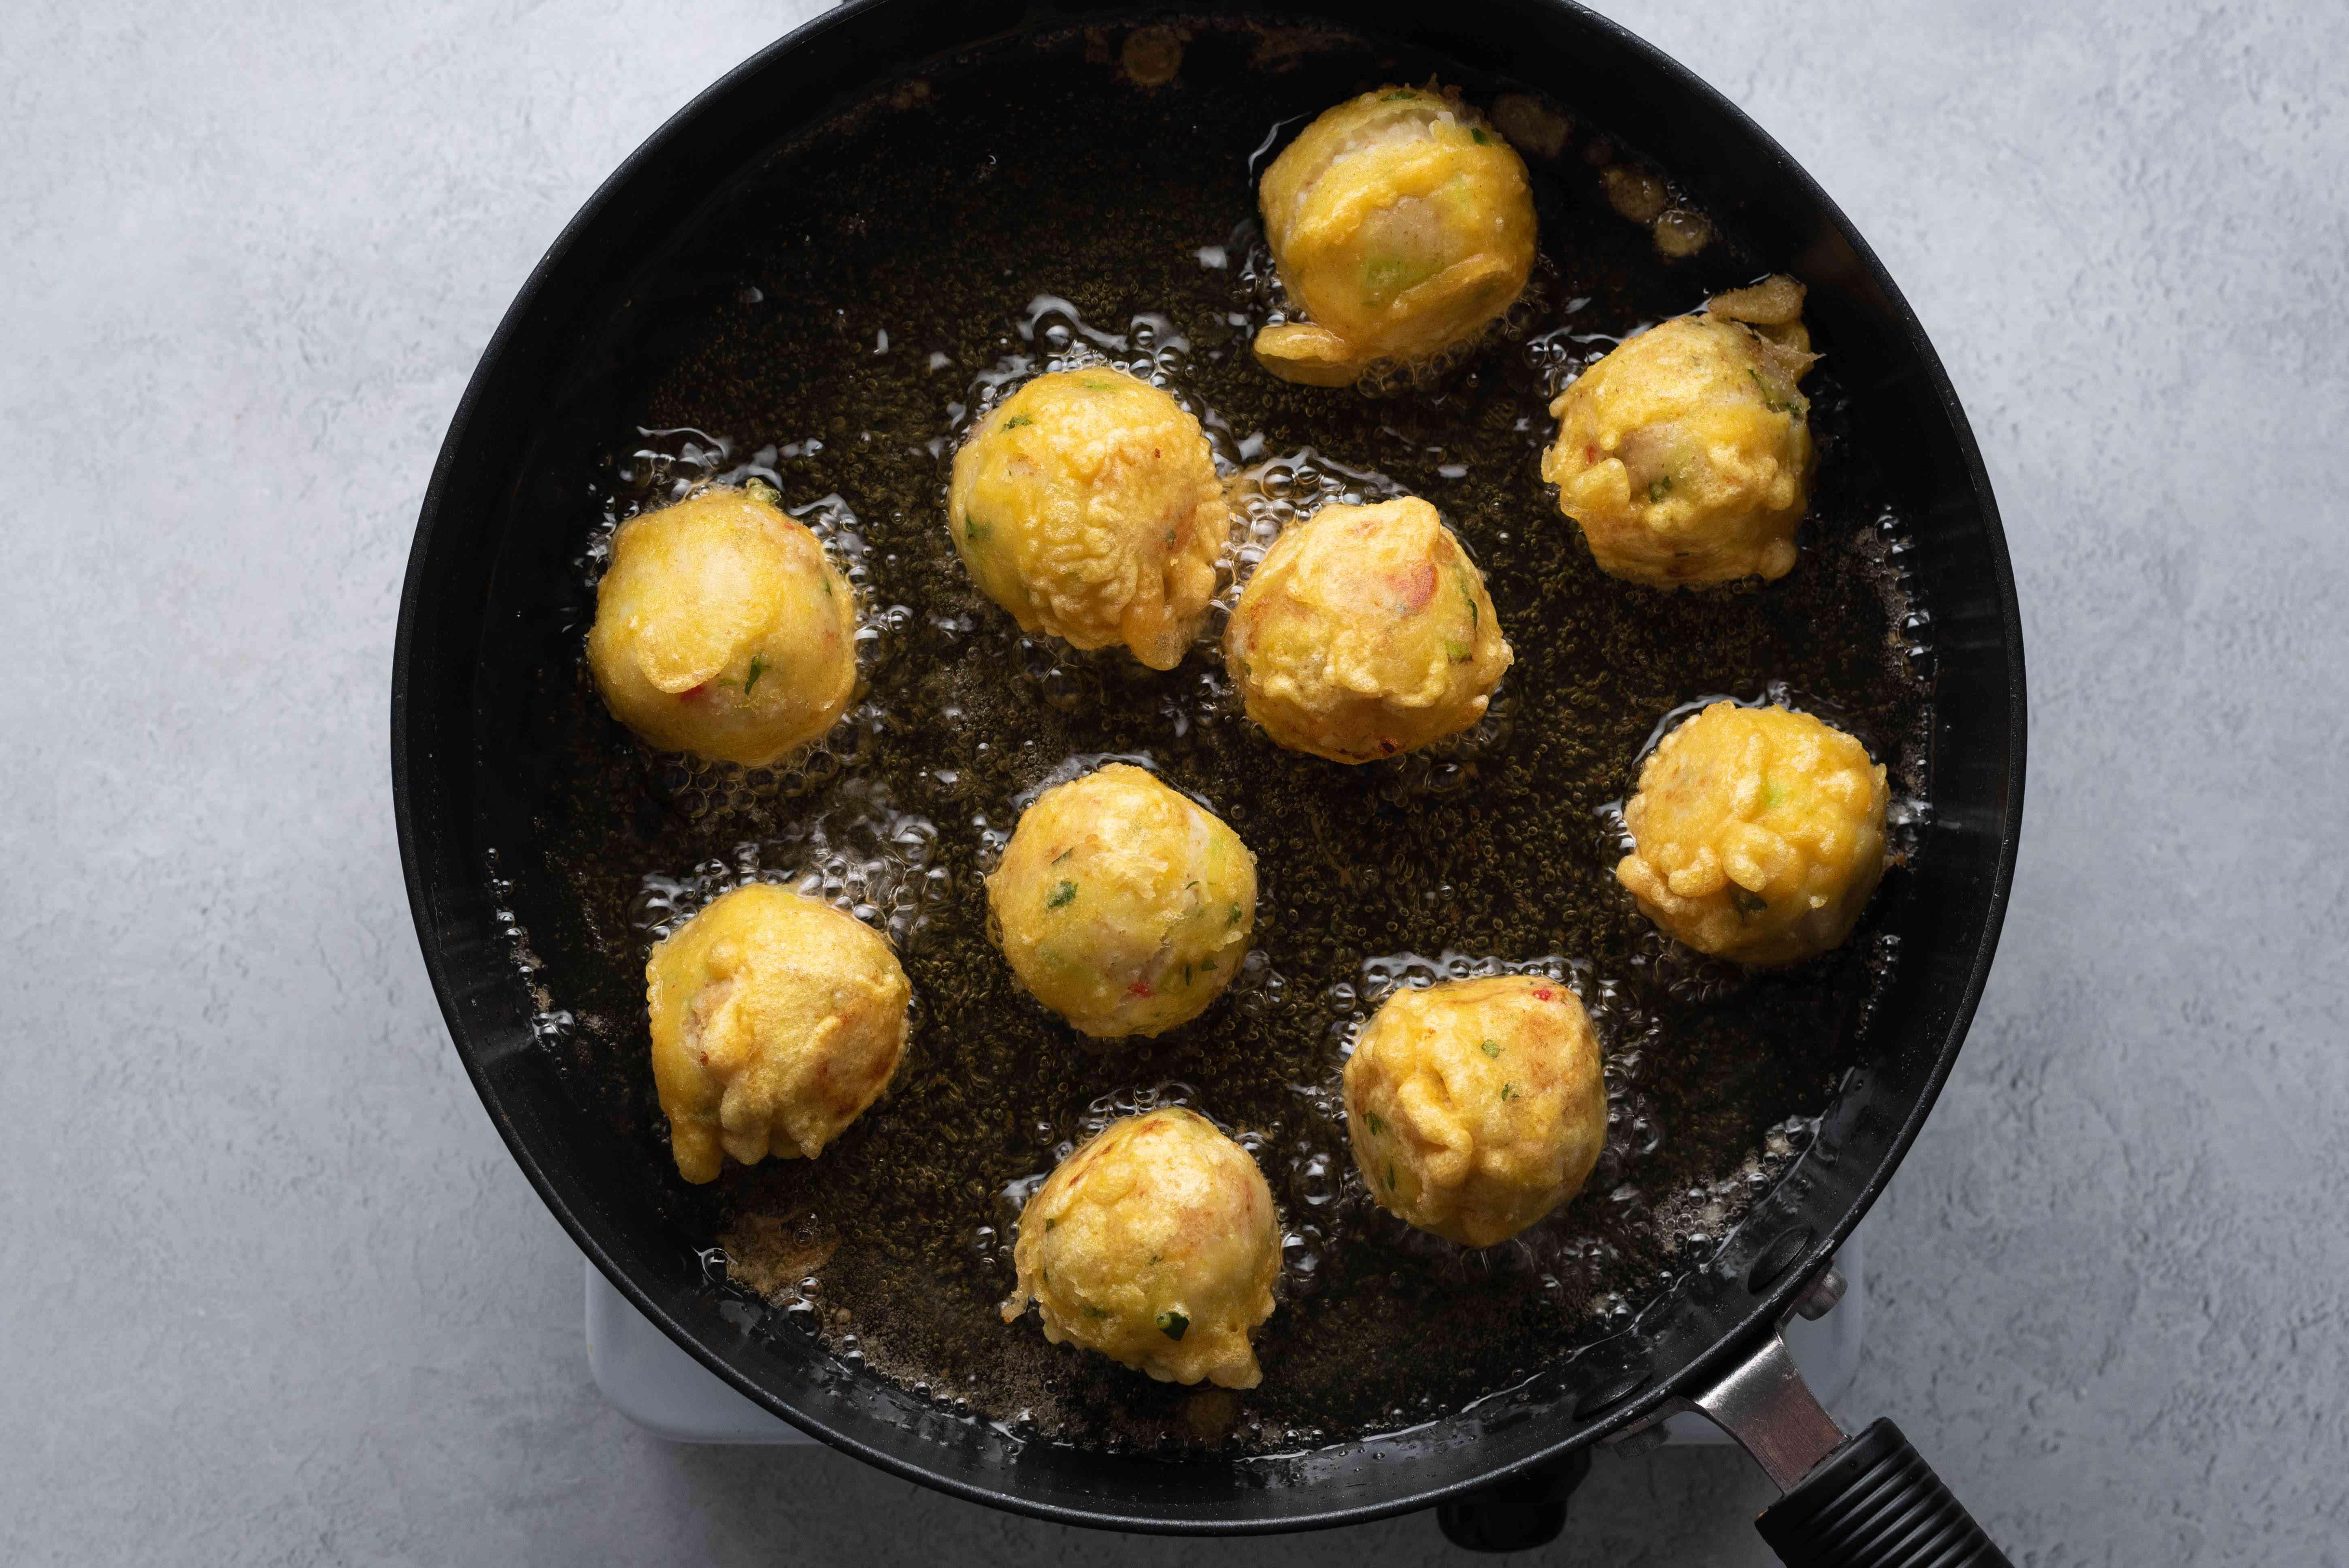 A pan of battered mashed potato balls frying